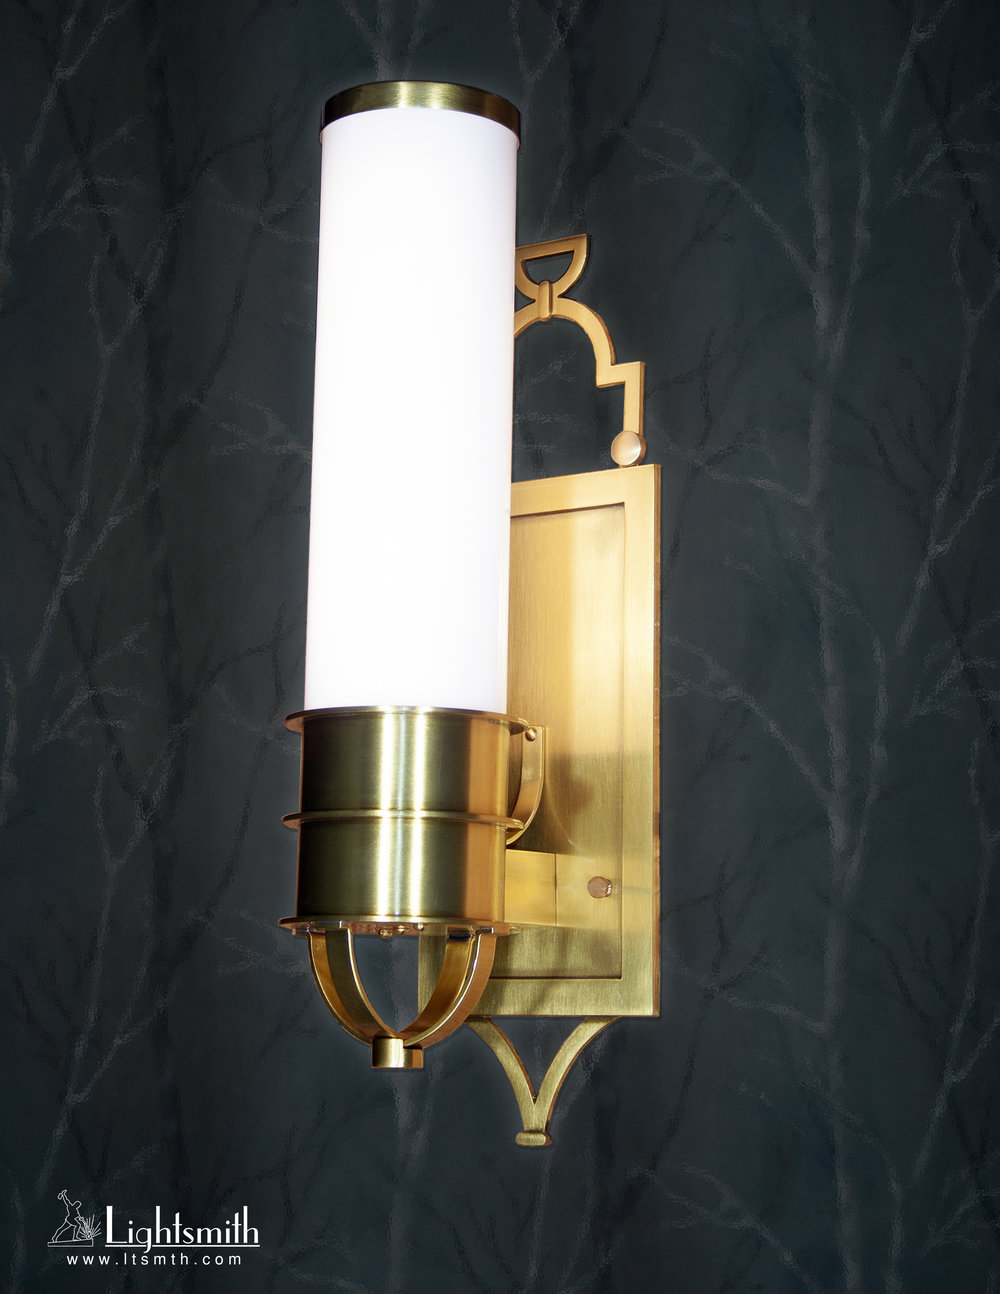 SC-11310 - Satin Brass - White Opal Acrylic